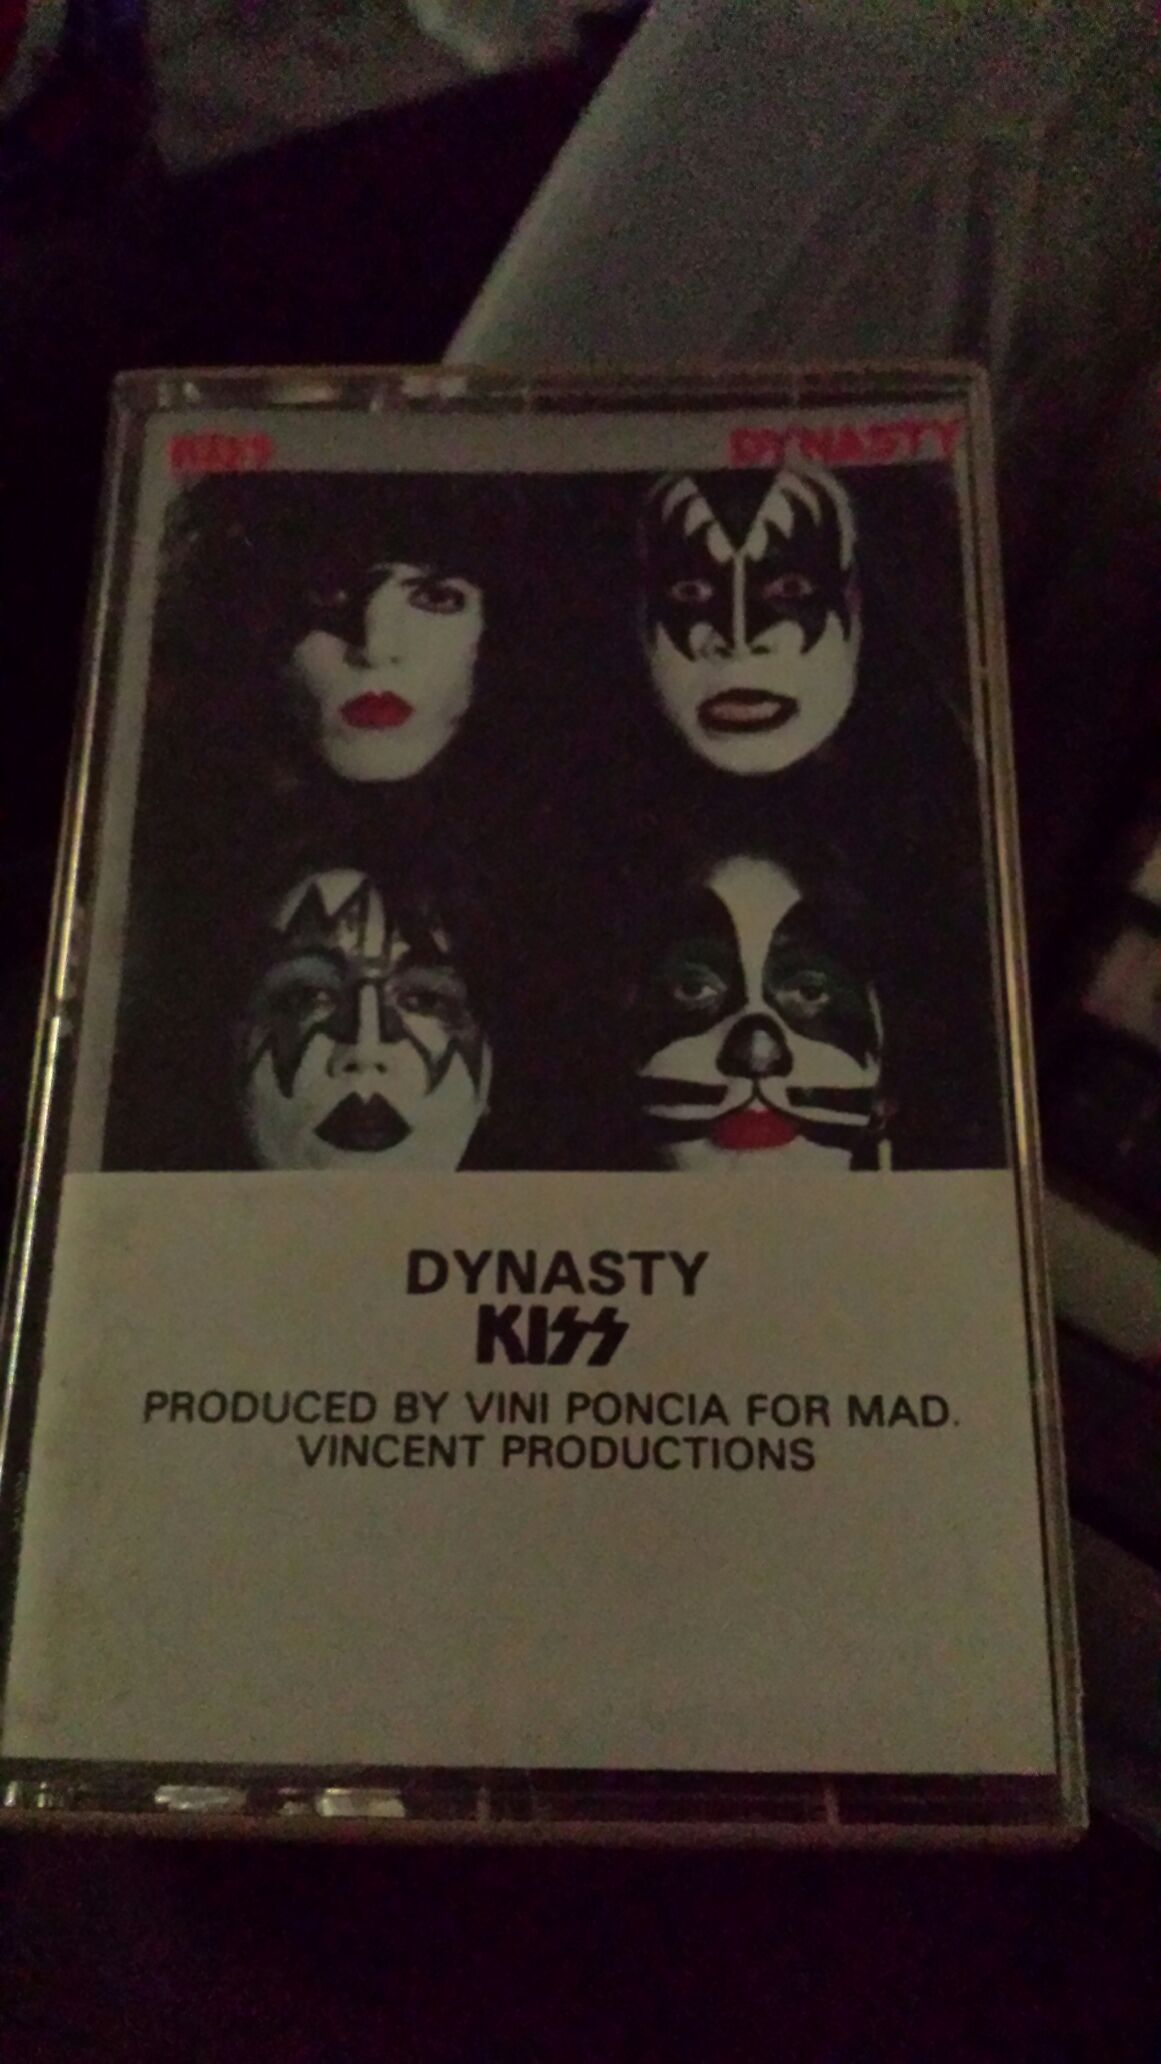 Dynasty - Cassette cover